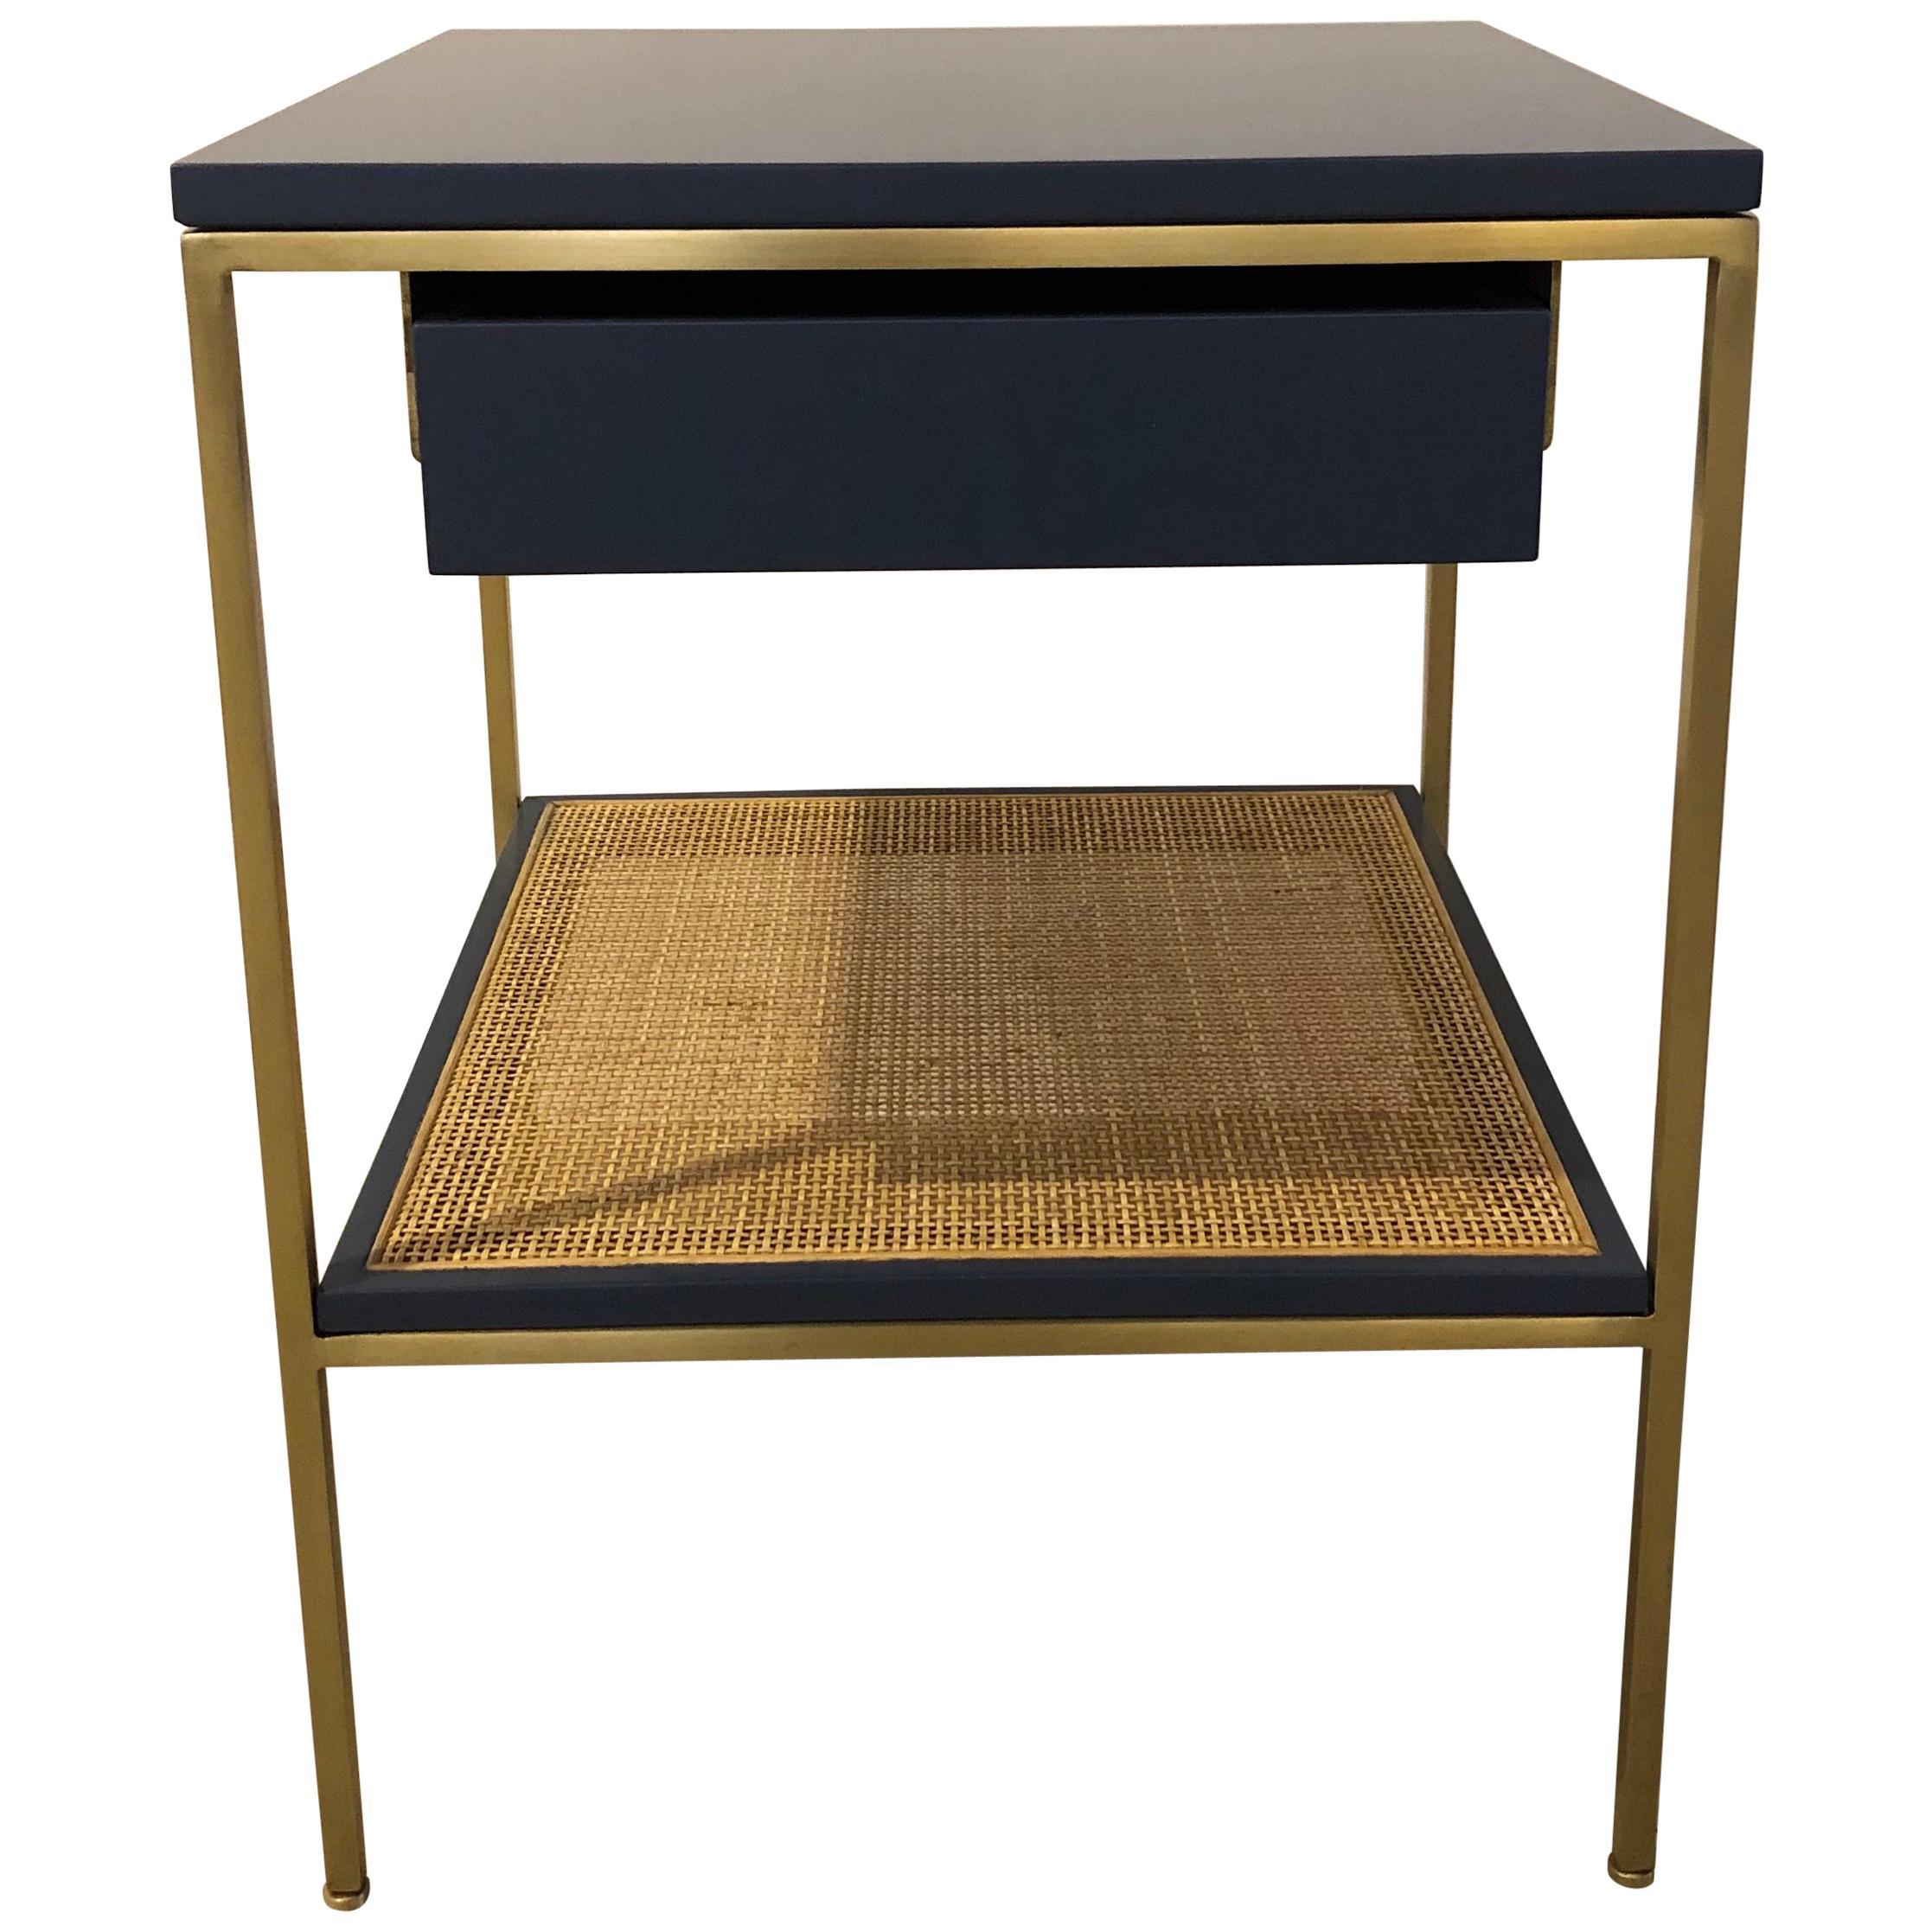 Re 392 Bedside Table In Kensington Blue On Satin Brass Frame With Caned  Shelf For Sale